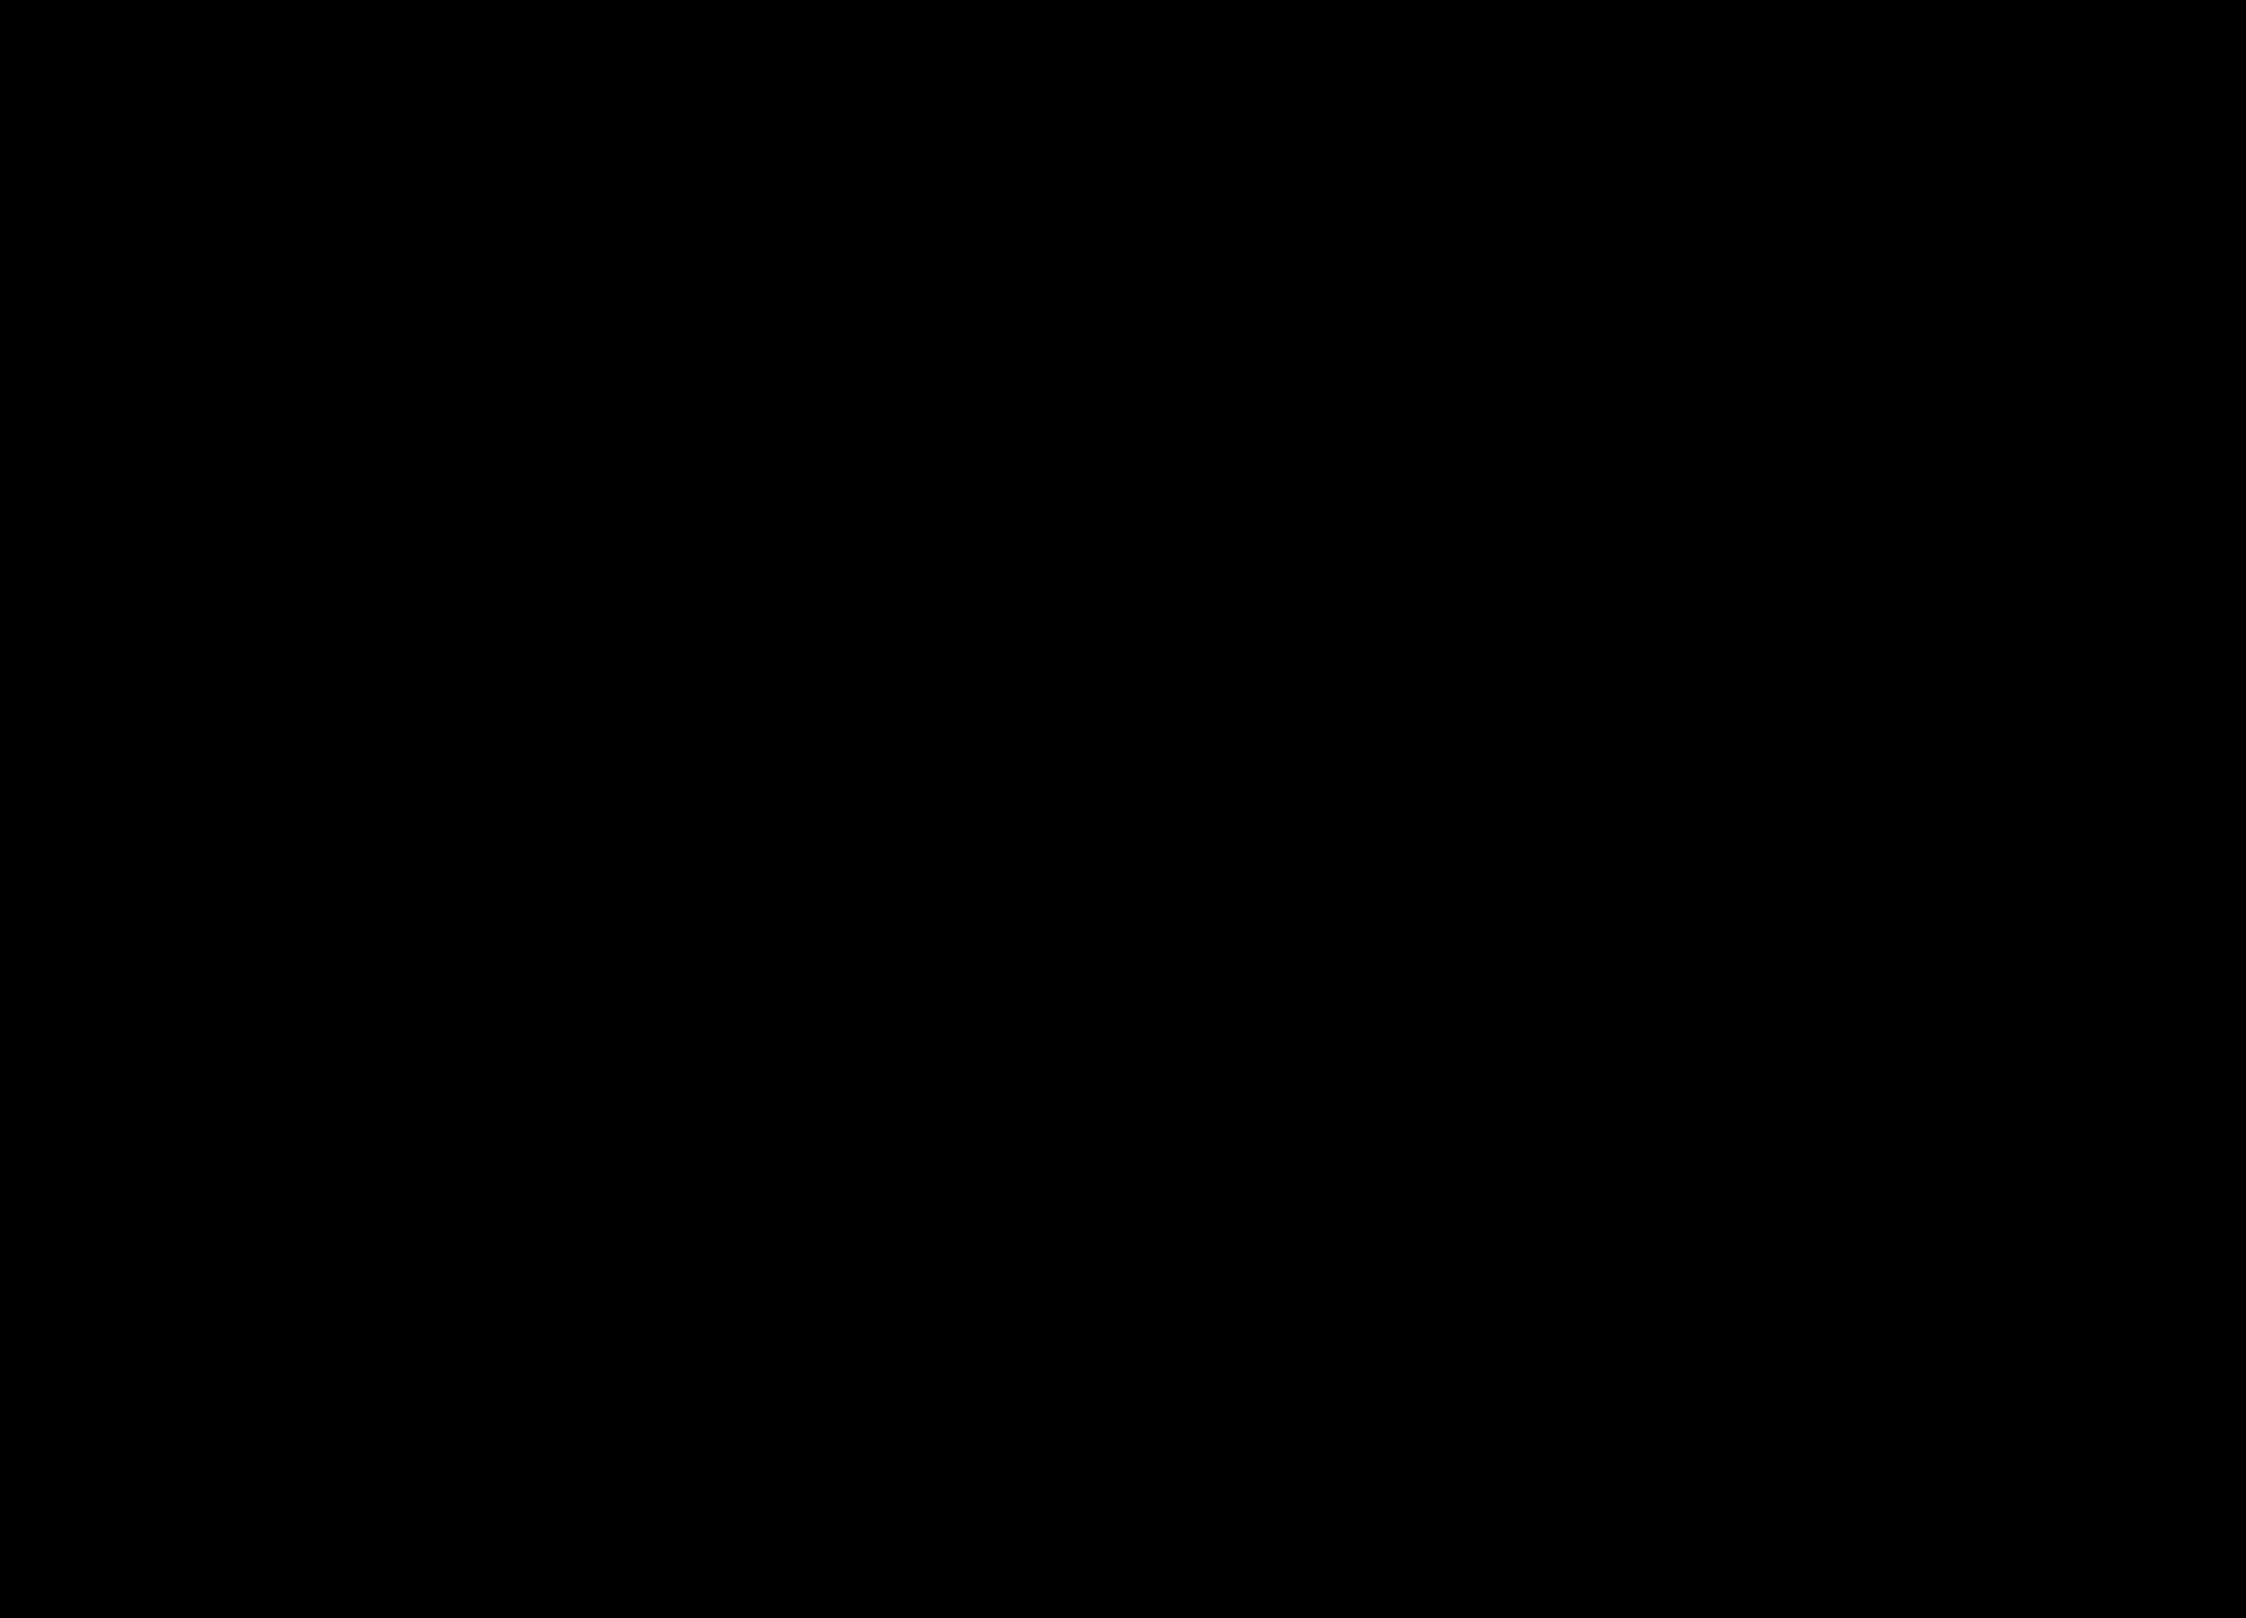 2246x1618 Evil Jack O Lantern Silhouette Icons Png